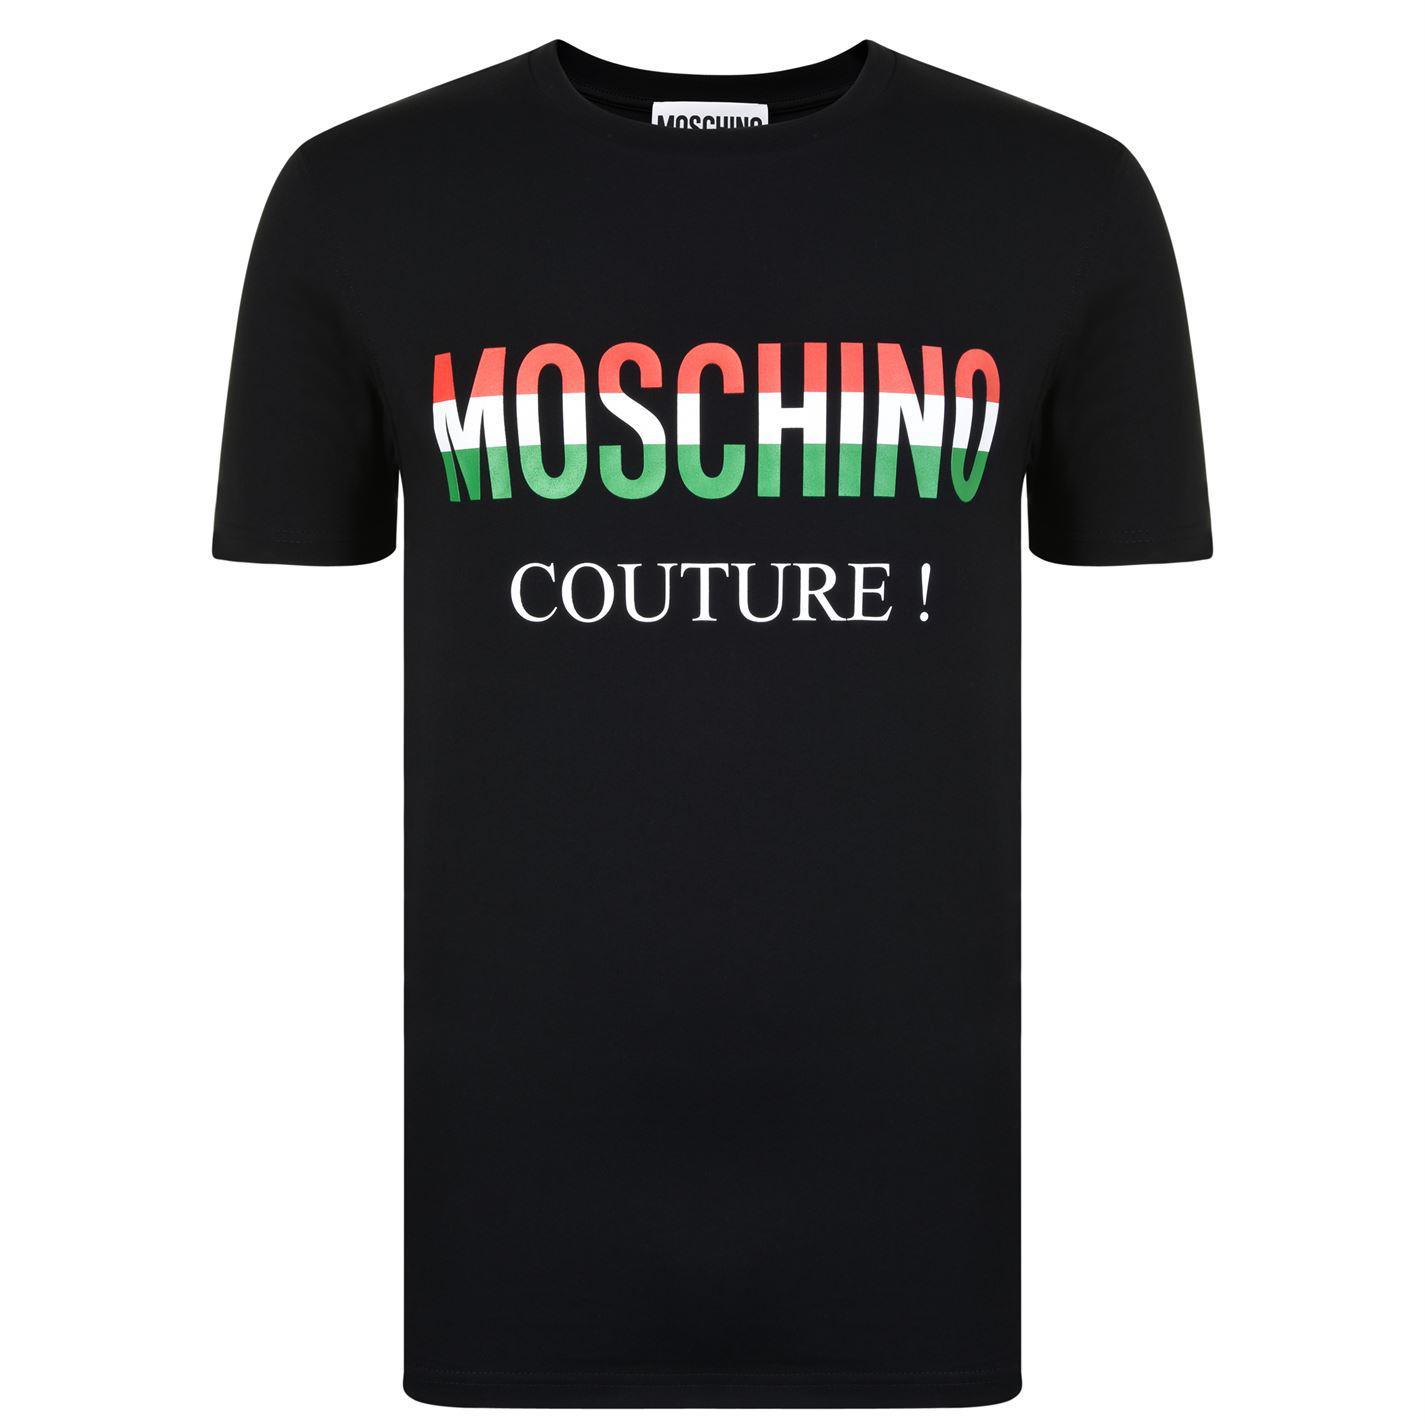 Moschino Couture Crewneck Sweatshirt Light Grey